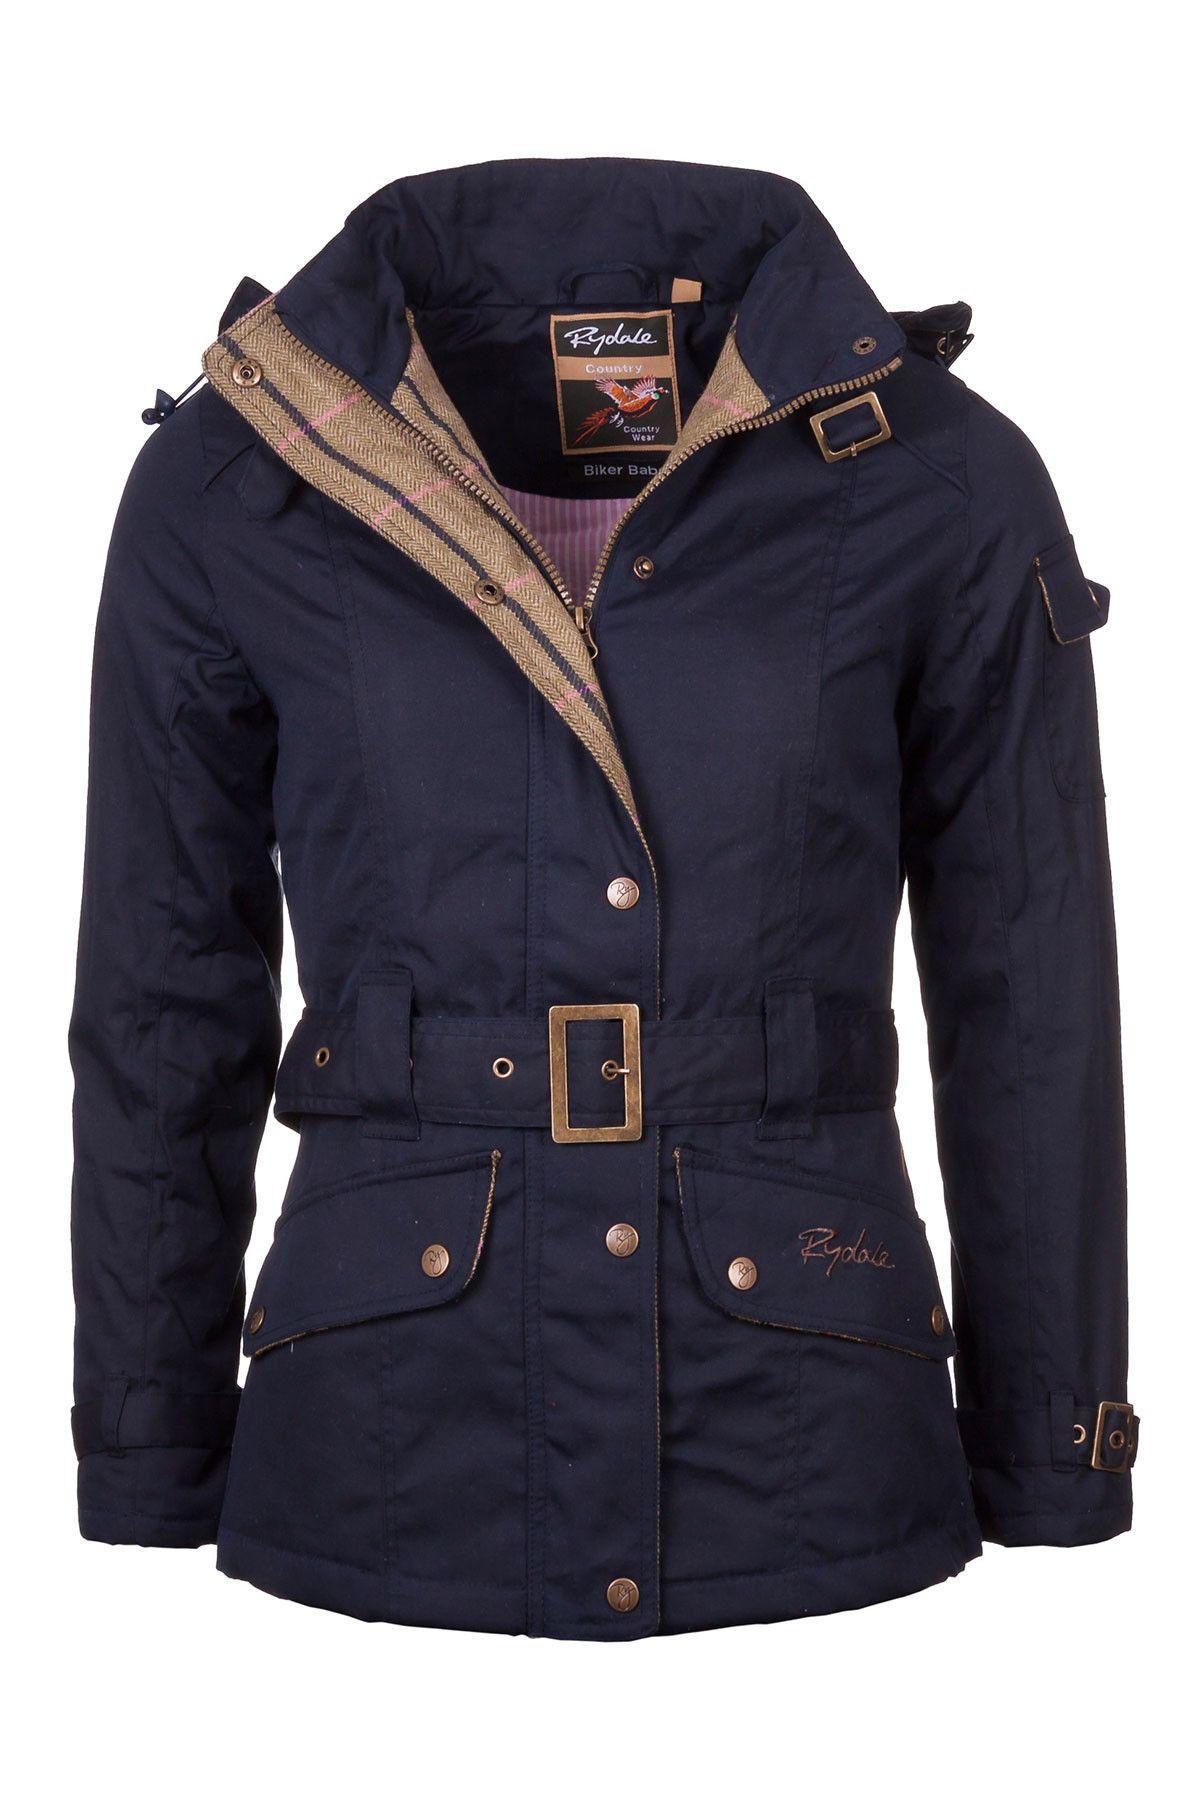 Rydale Ladies Wax Belted Biker Babe Jacket